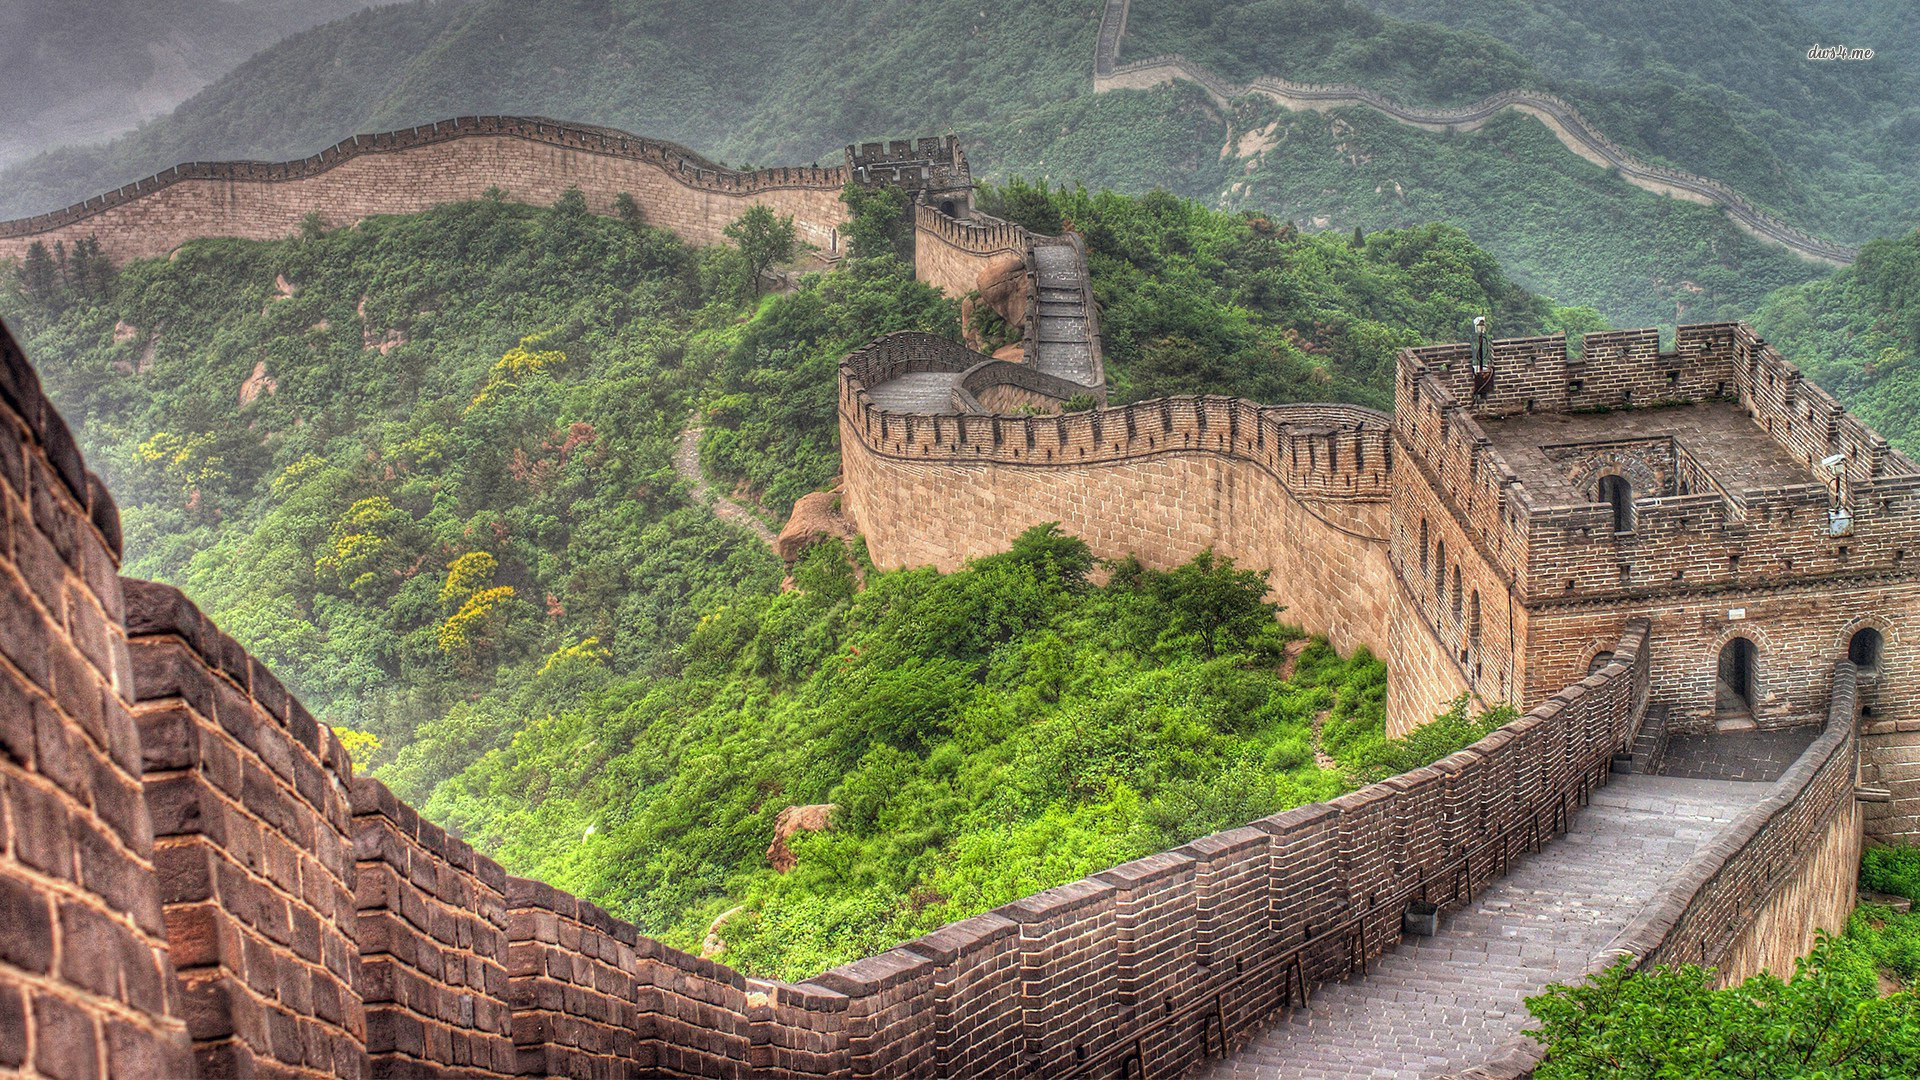 Wall of China High Quality Wallpaper HD 1920x1080